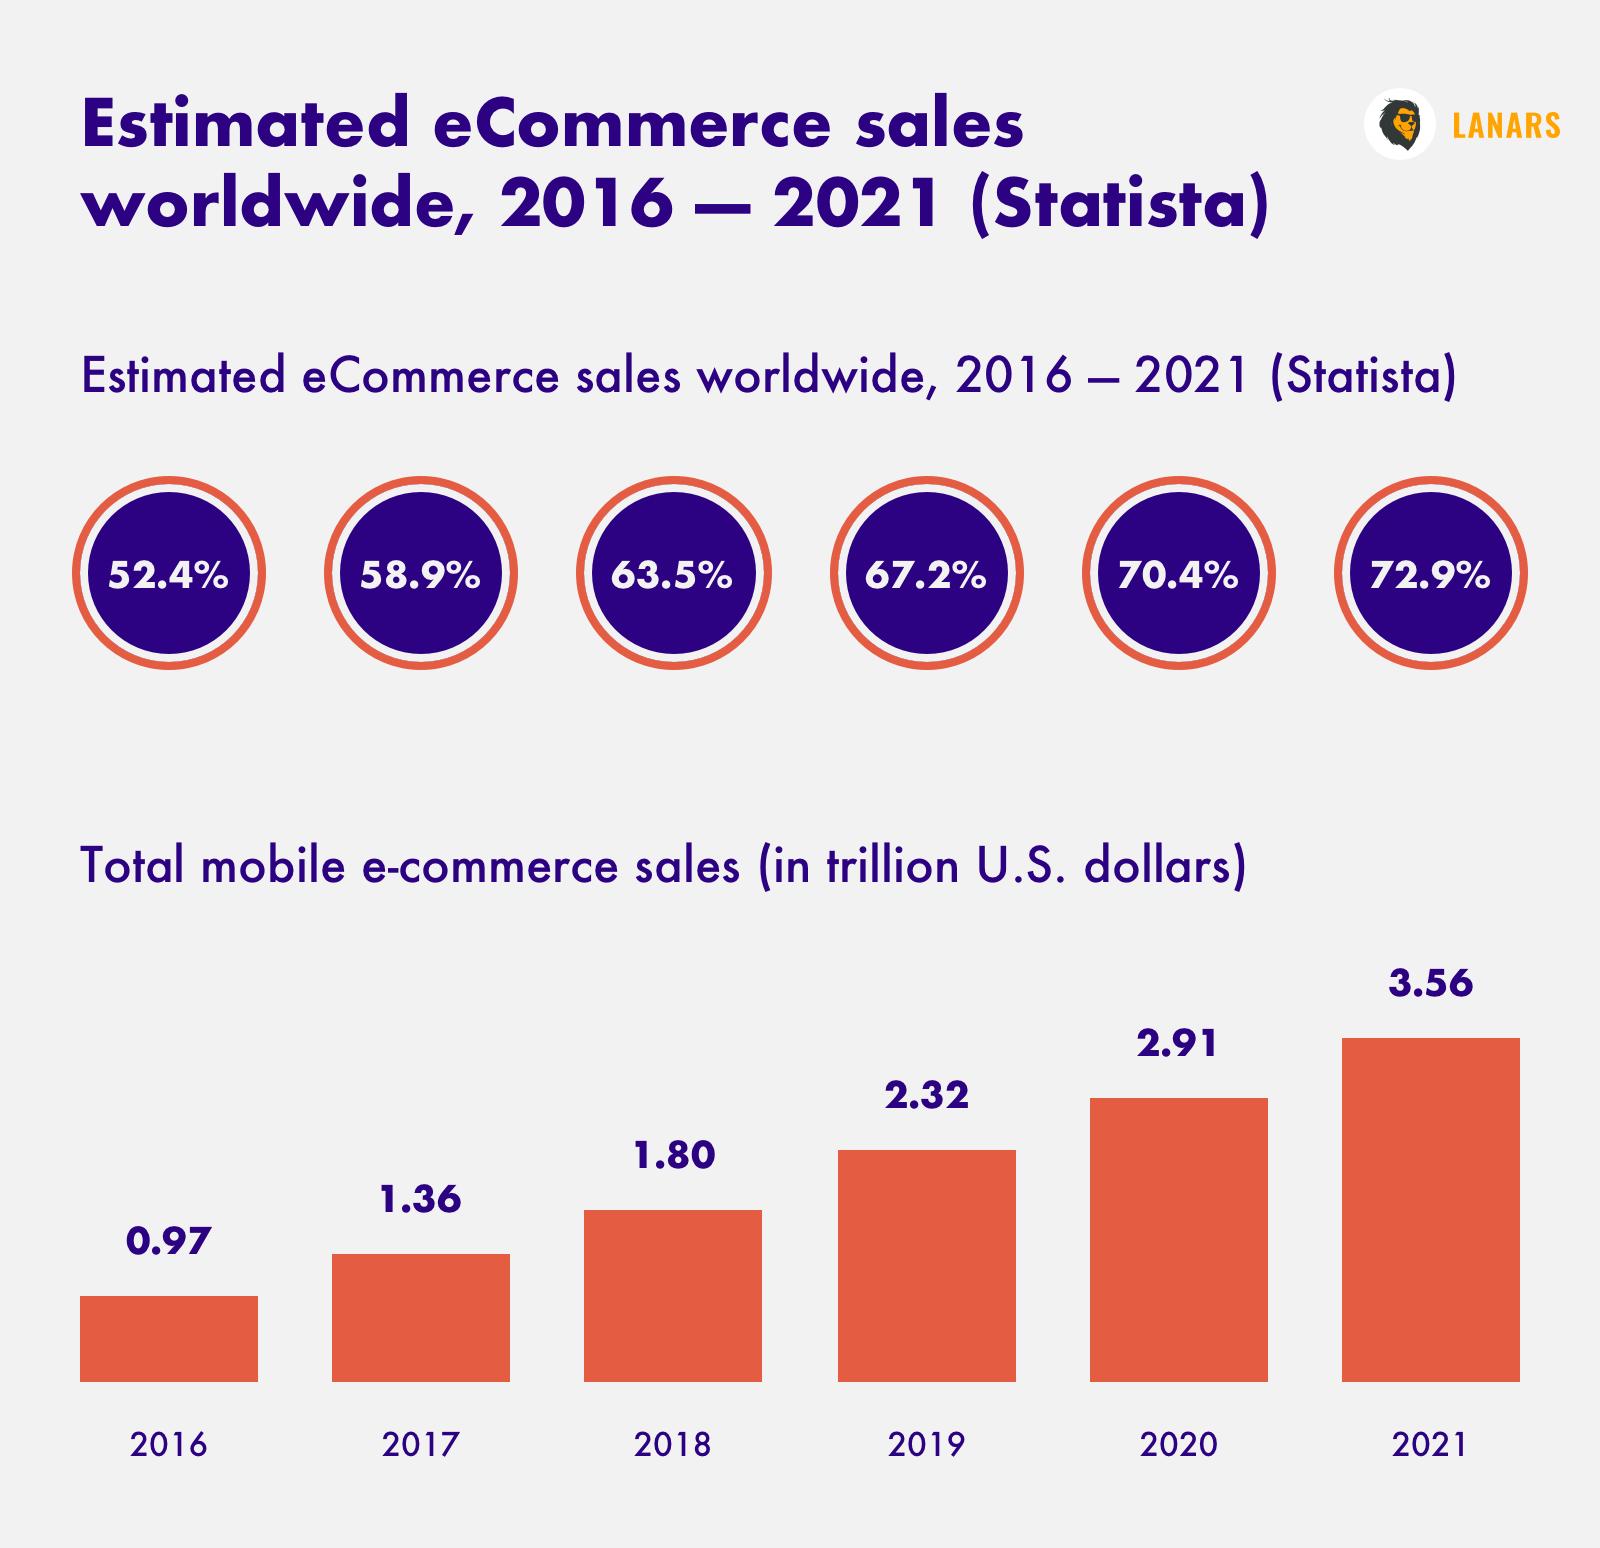 Estimated eCommerce sales worldwide, 2016—2021 (Statista)